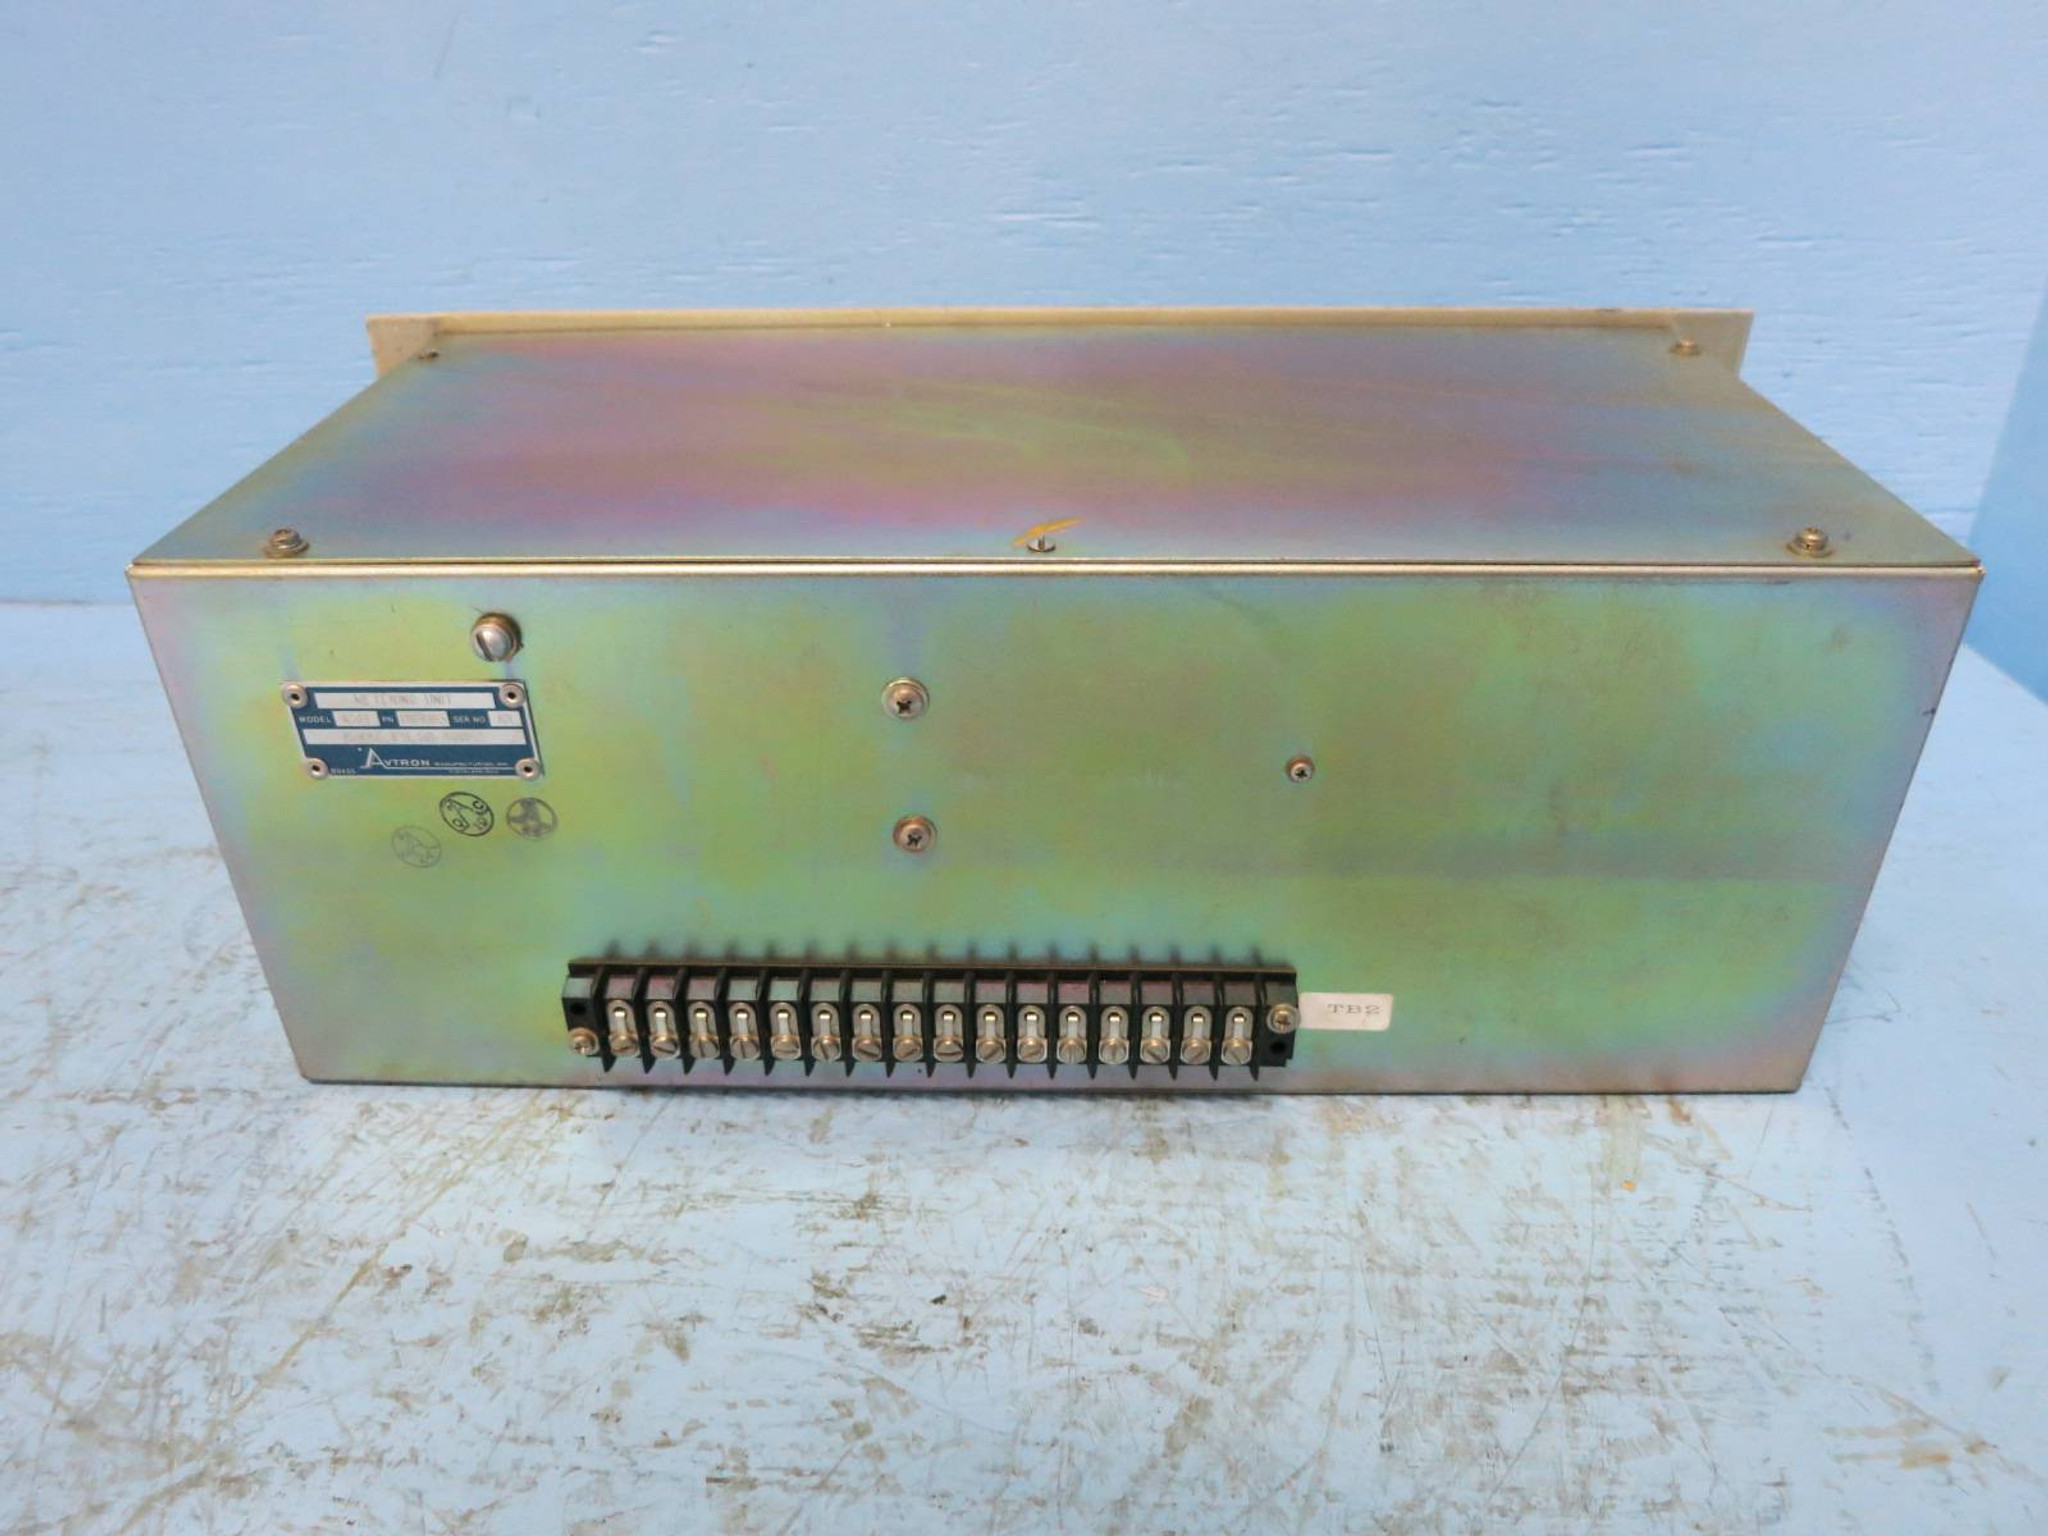 Avtron Model K514-D16865 Metering Unit Digital Readout Display 115V Power  Supply (DW0760-1)